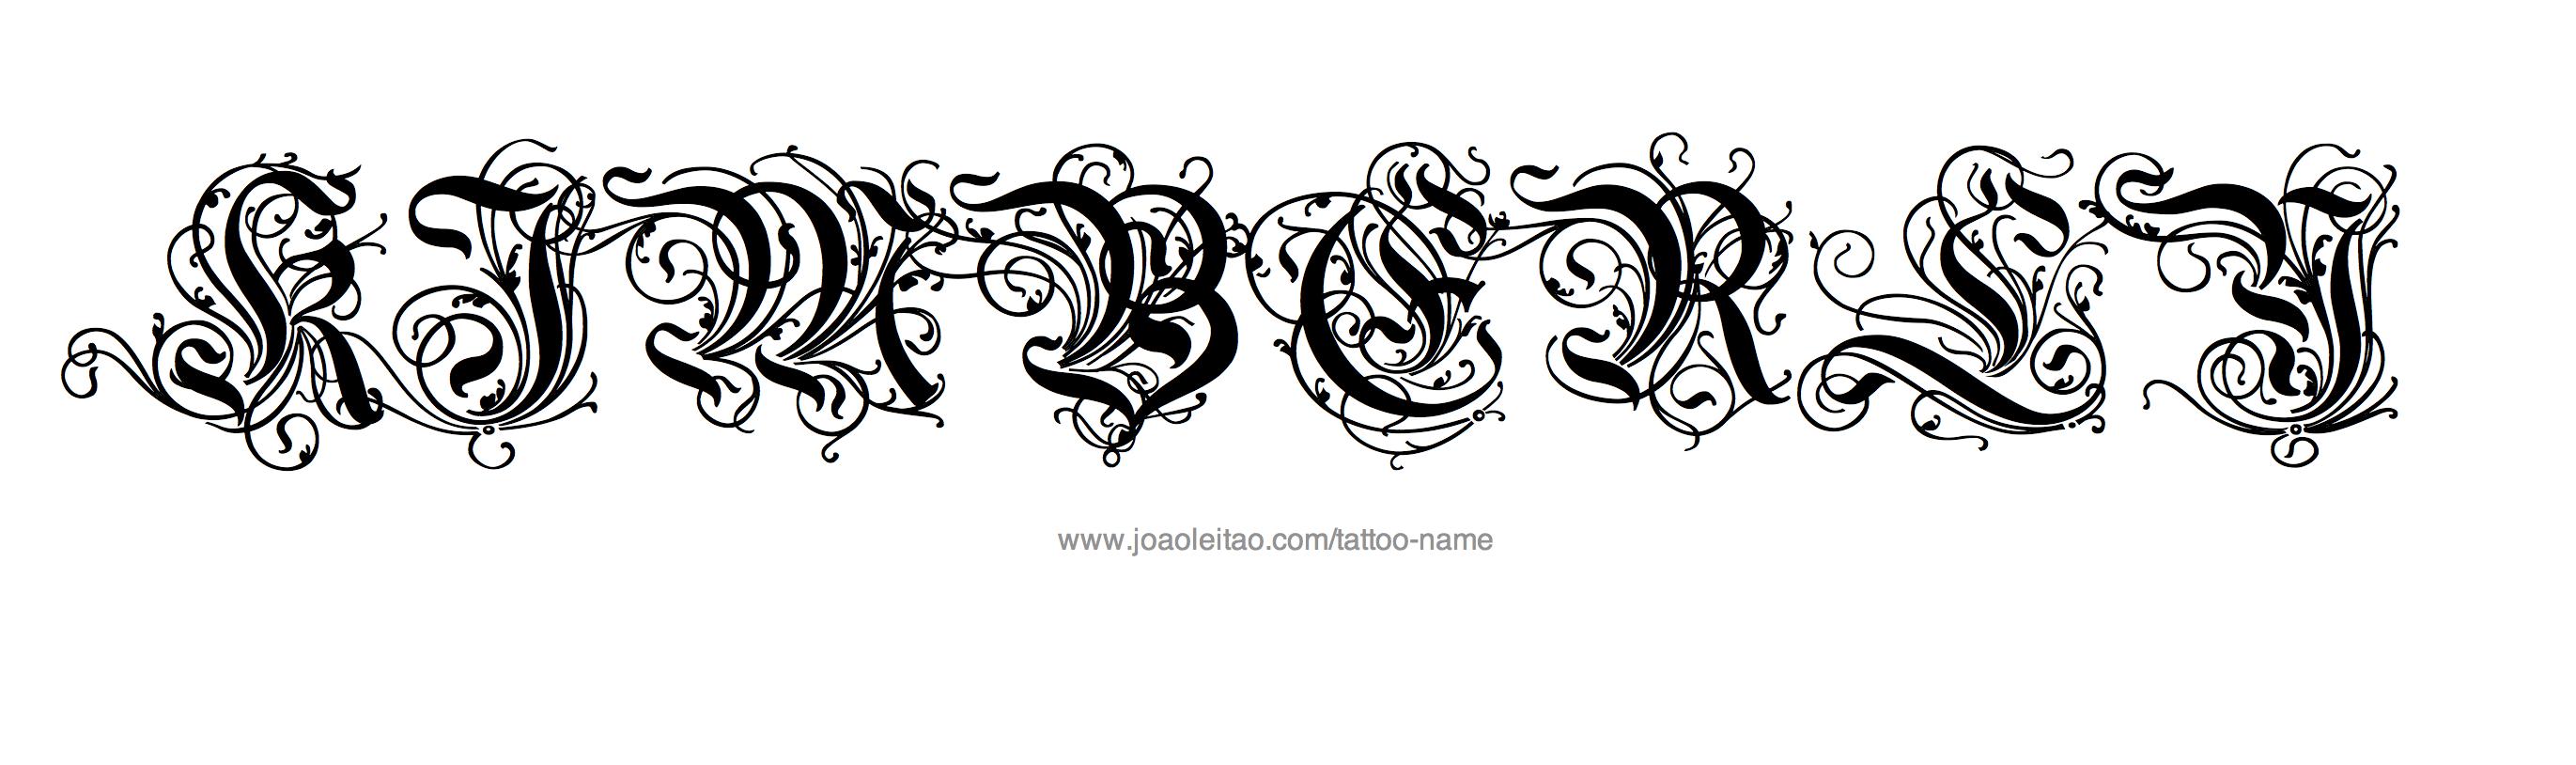 dibujos de cruces goticas hawaii dermatology tattoo. Black Bedroom Furniture Sets. Home Design Ideas